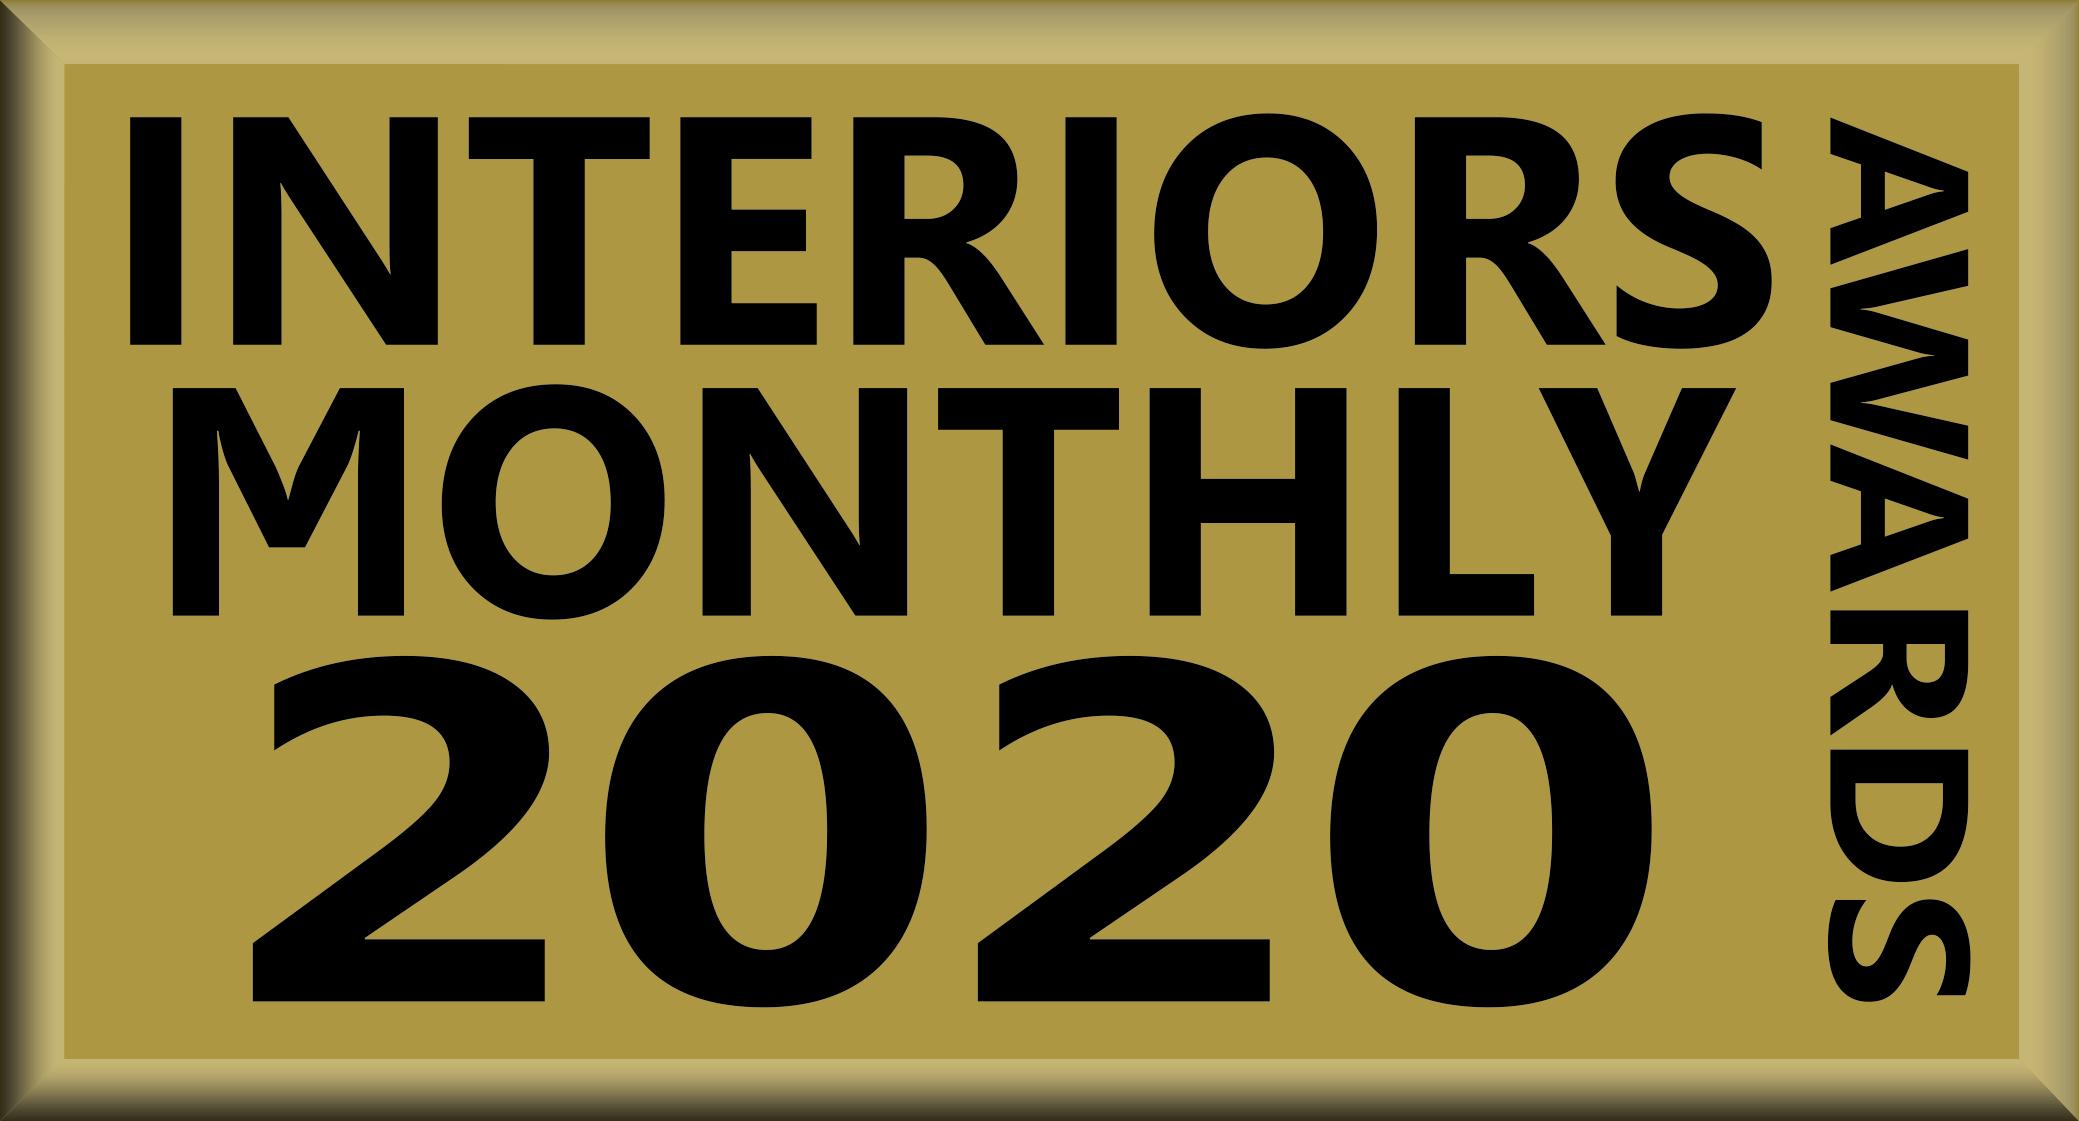 Interiors Monthly award